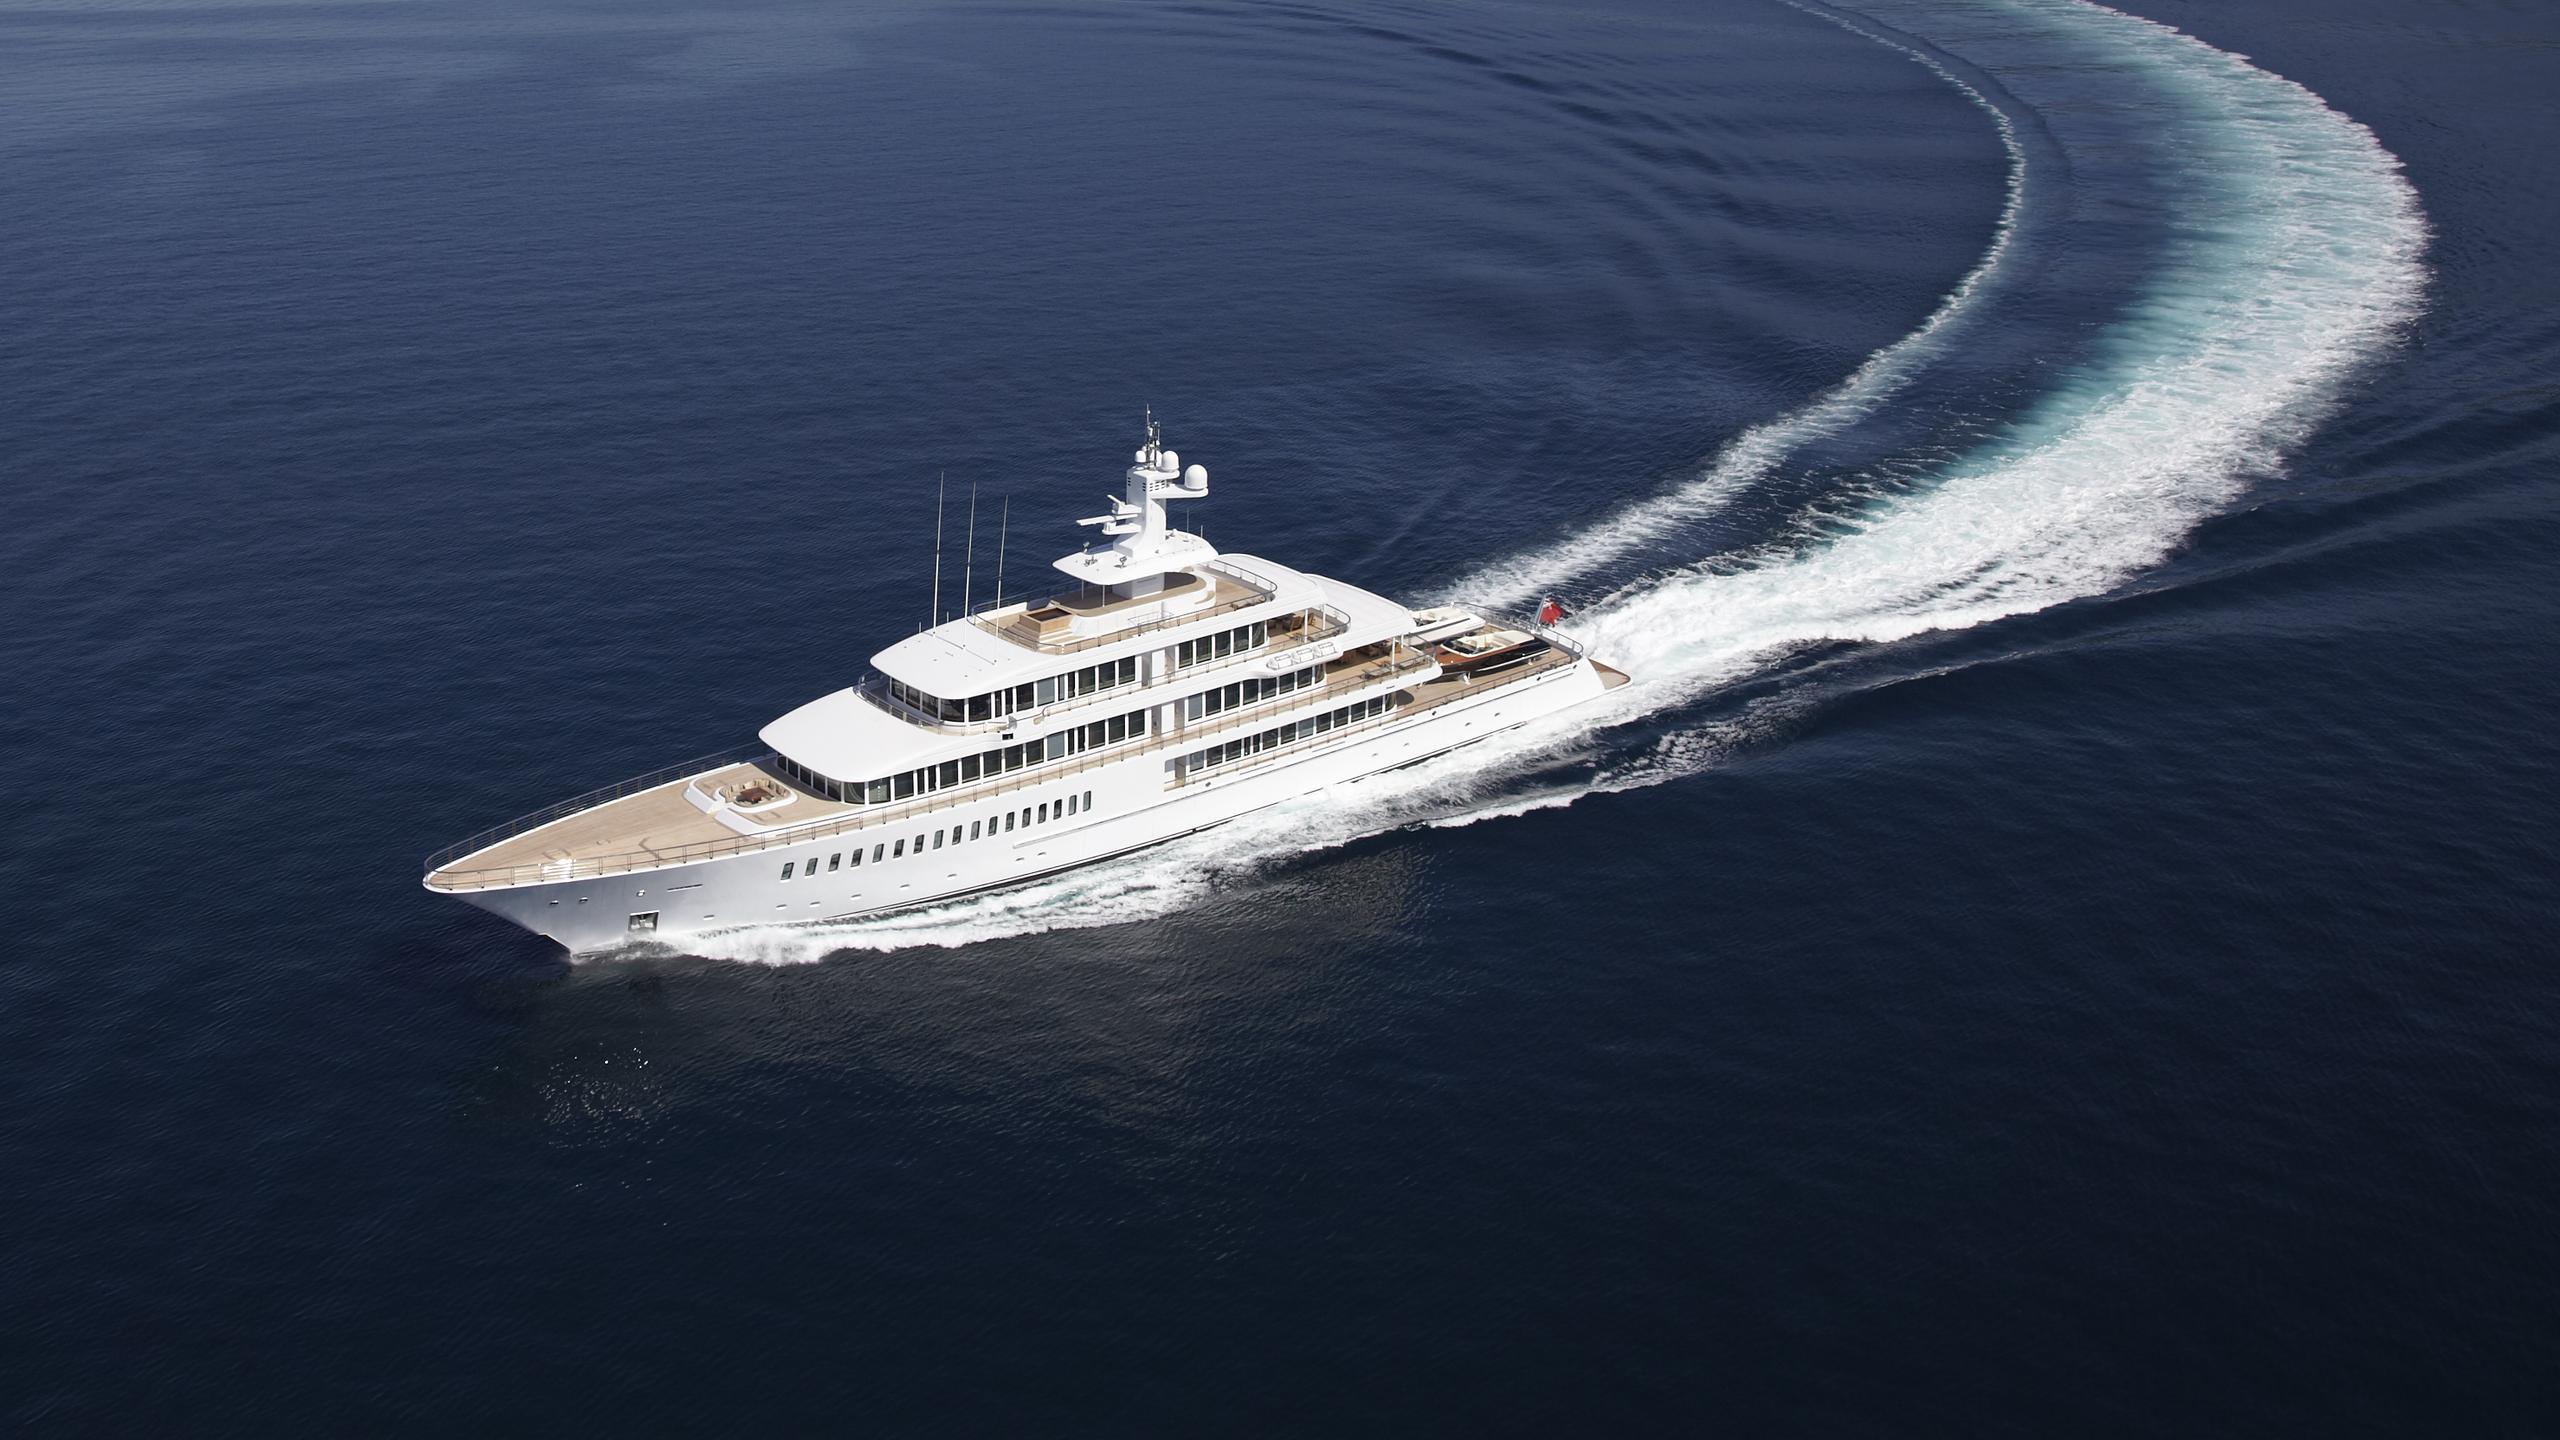 musashi-motor-yacht-feadhsip-2011-88m-aerial-cruising